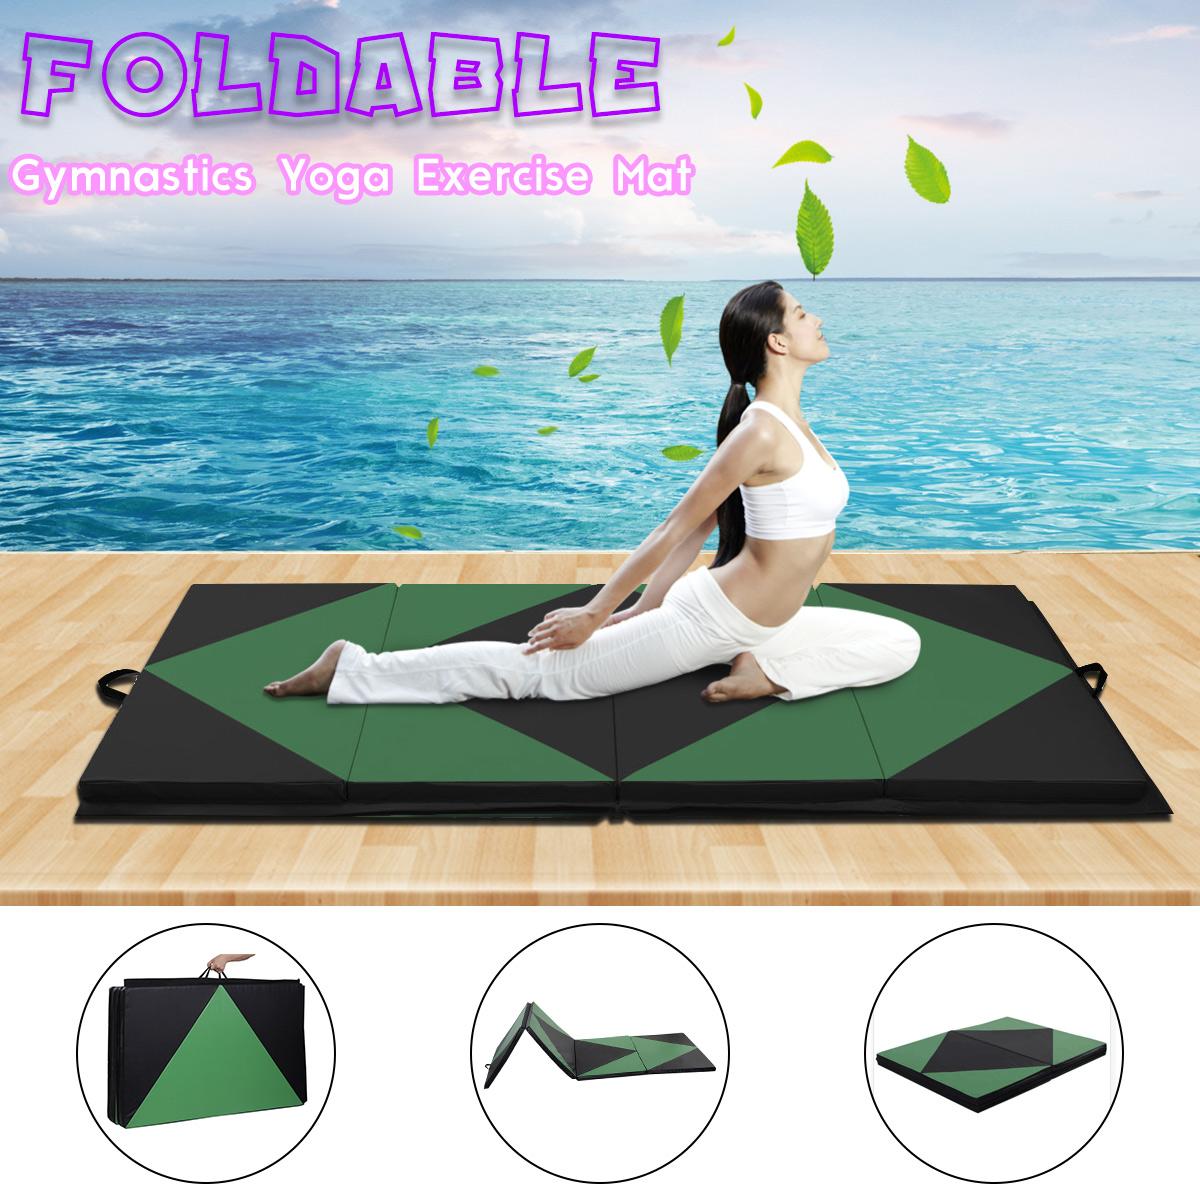 Large Folding Panel Yoga Exercise Gymnastics Thick Gym Fitness Tumbling Mat 240x120x5cm